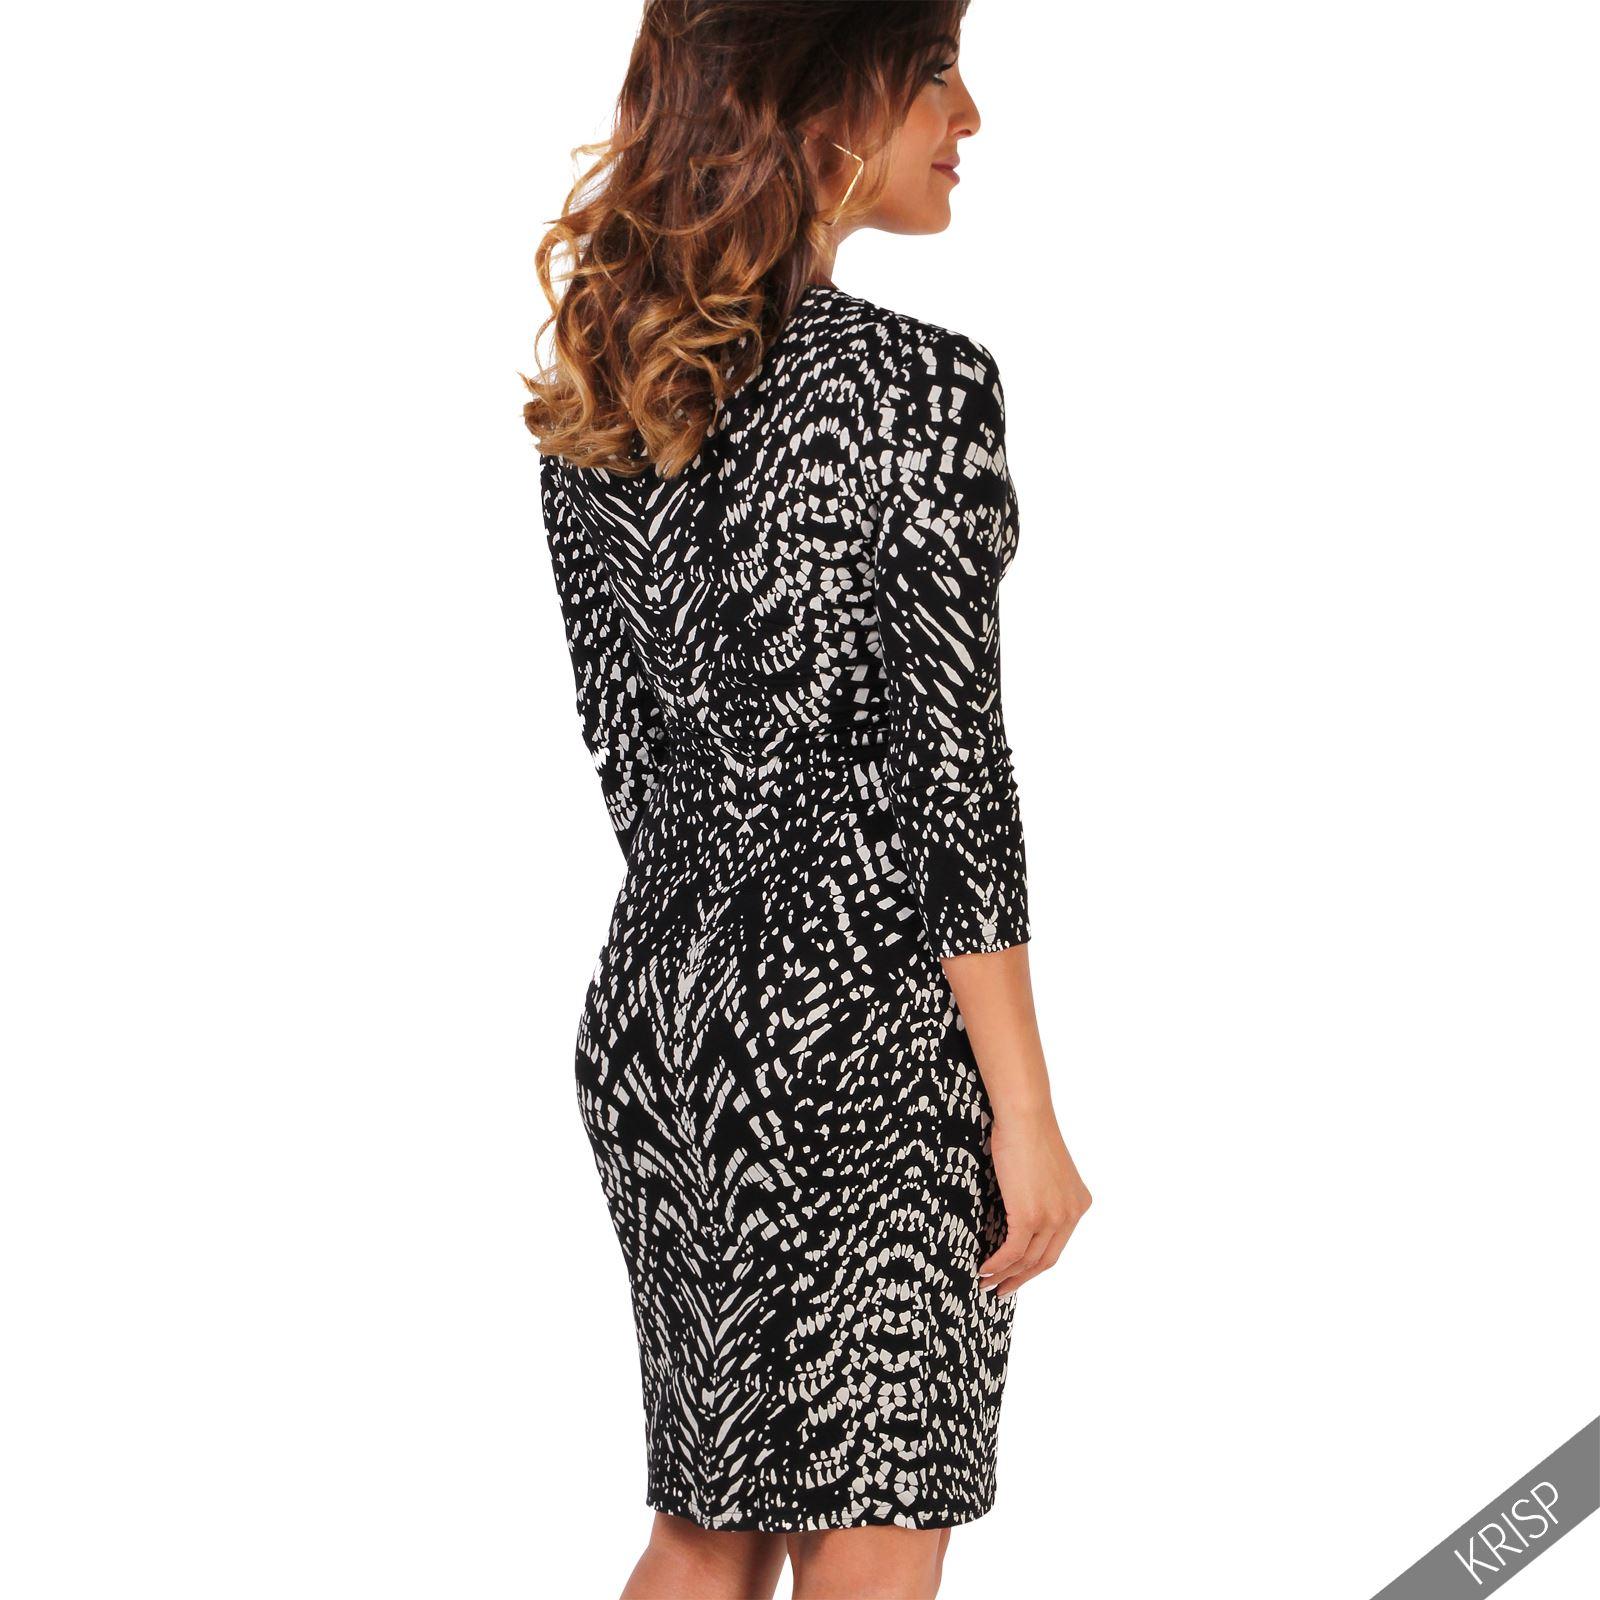 Womens-V-Neck-Dress-Top-Bodycon-Skirt-Midi-Snakeskin-Print-Cross-Over-Party-Wrap thumbnail 16